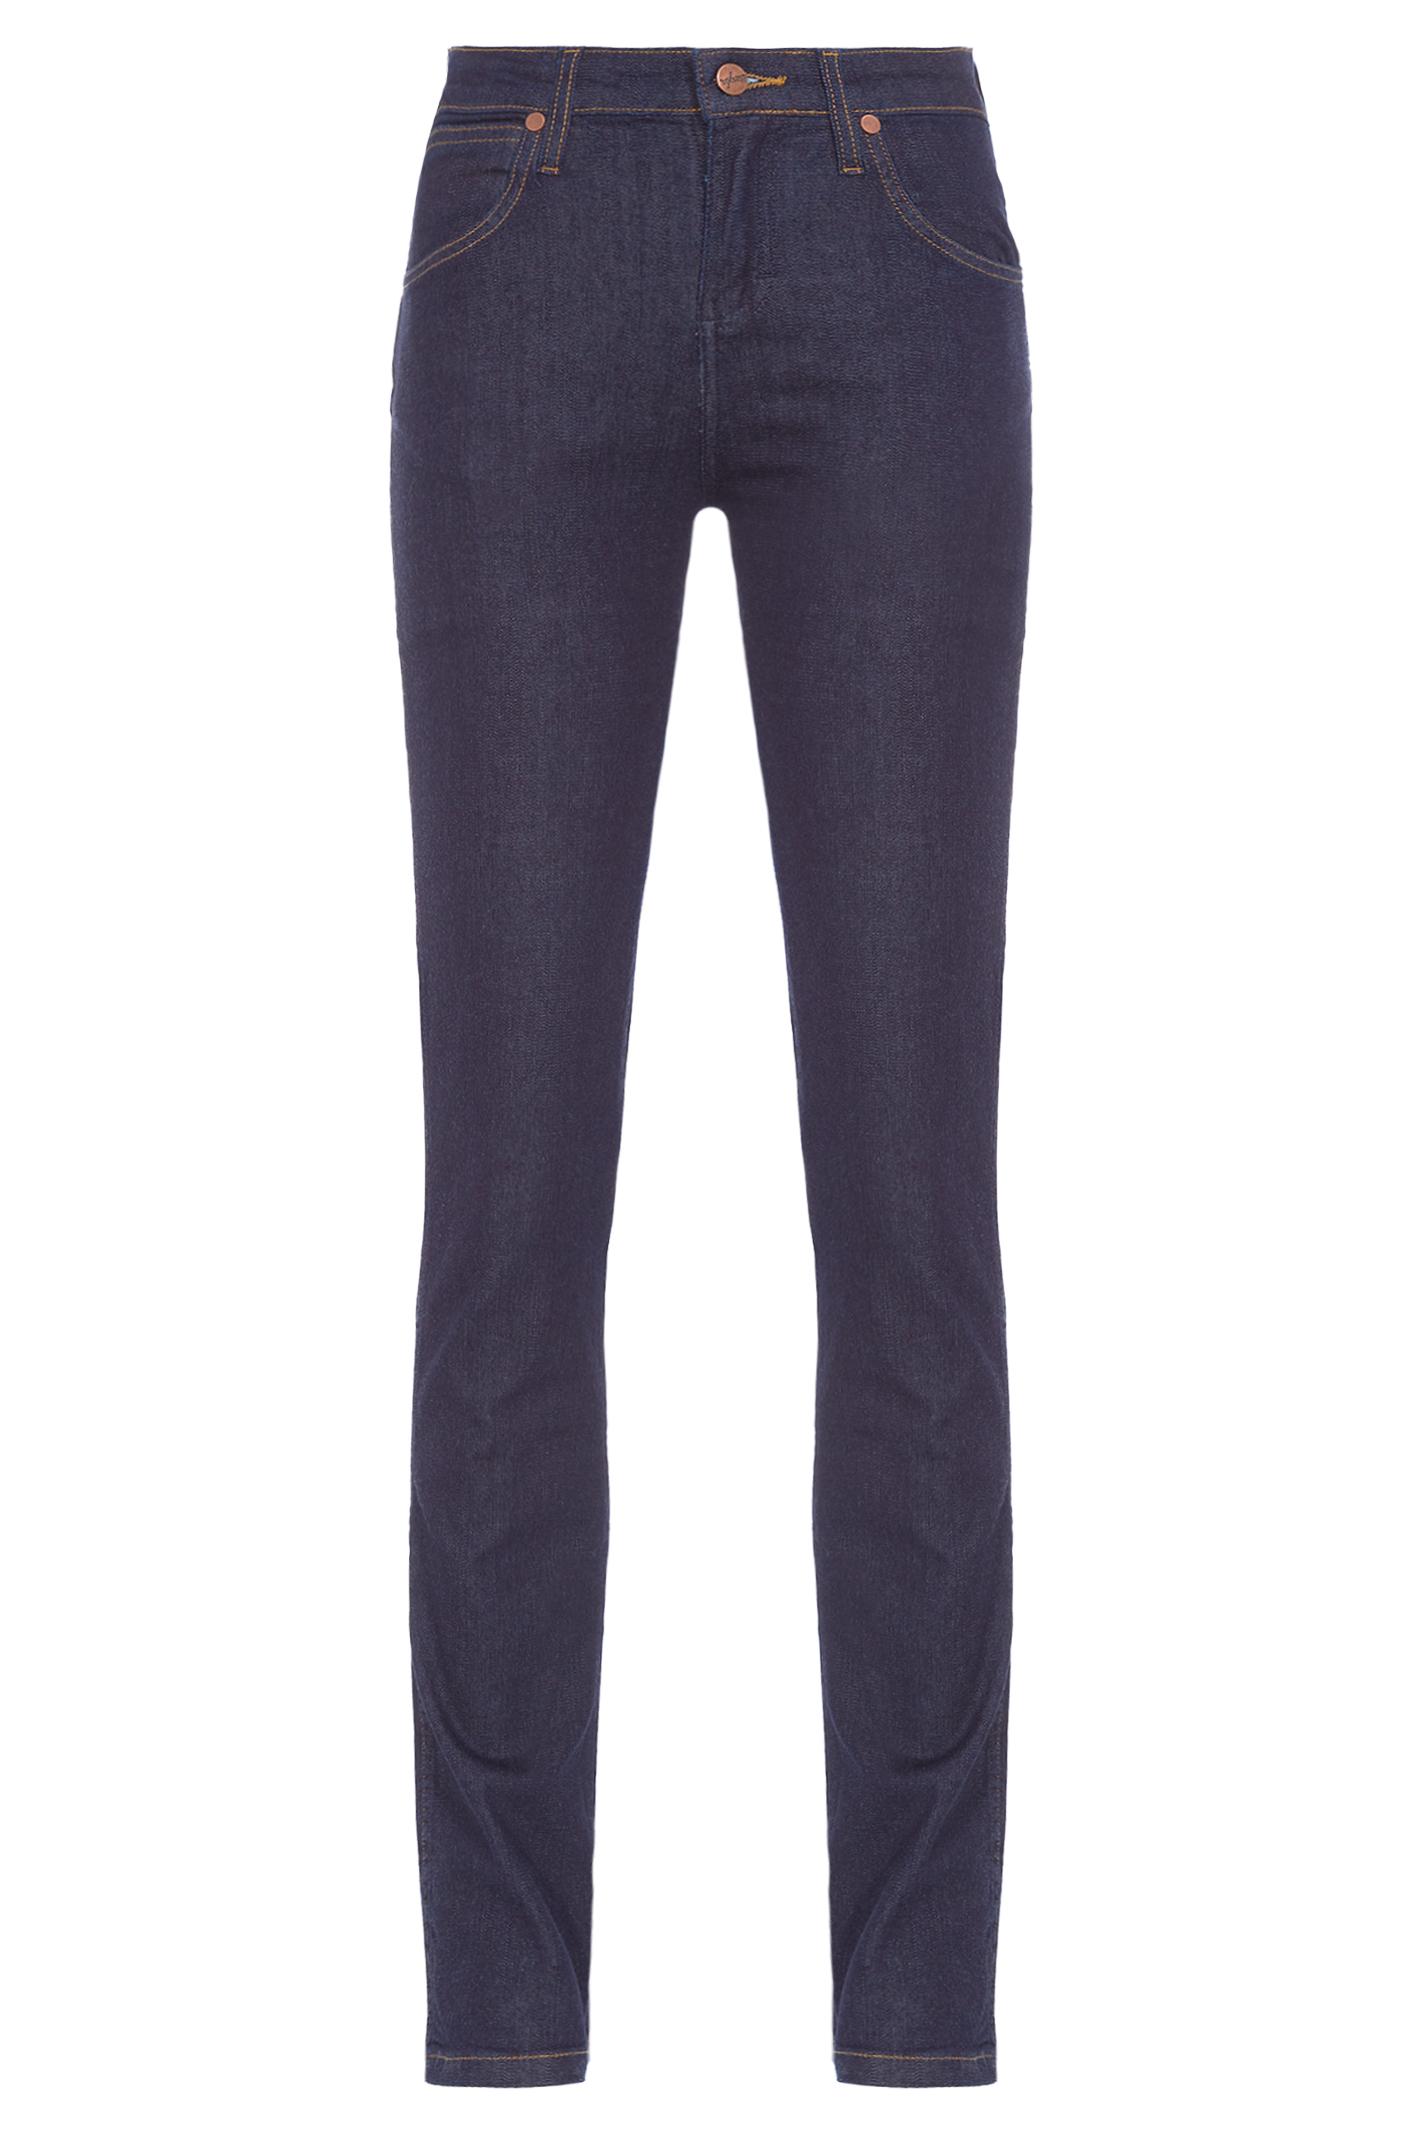 Calça Jeans 18M Western B Reta